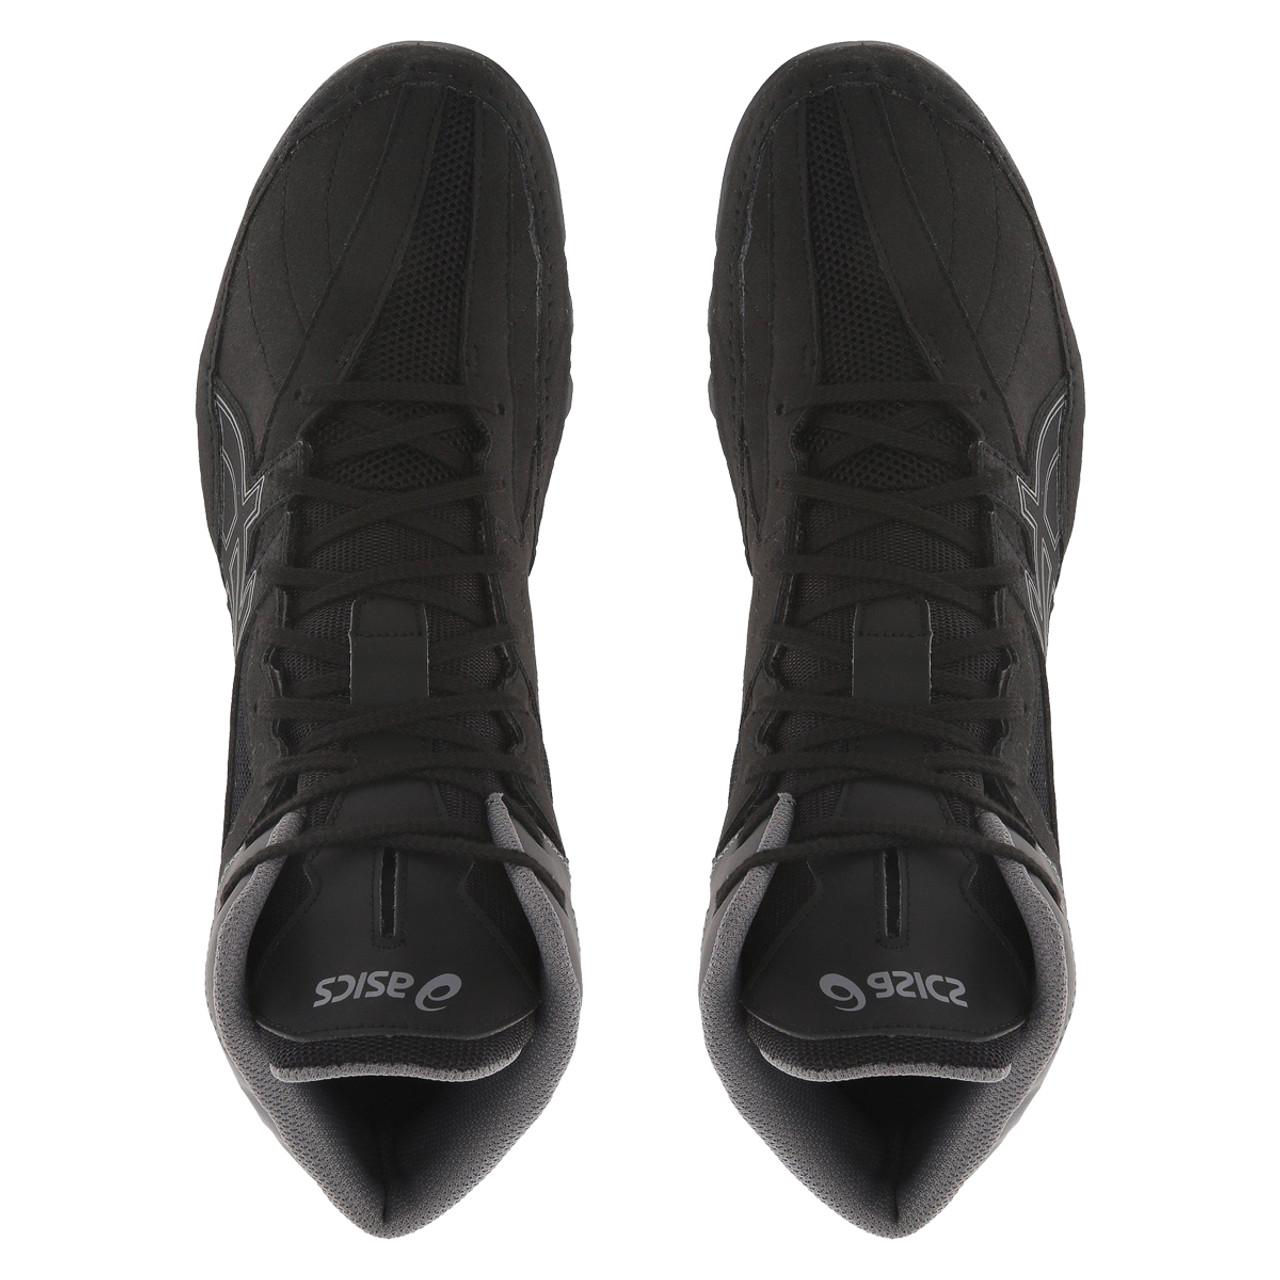 25cc92104947 Asics Mat Control Men s Wrestling Shoes - Black